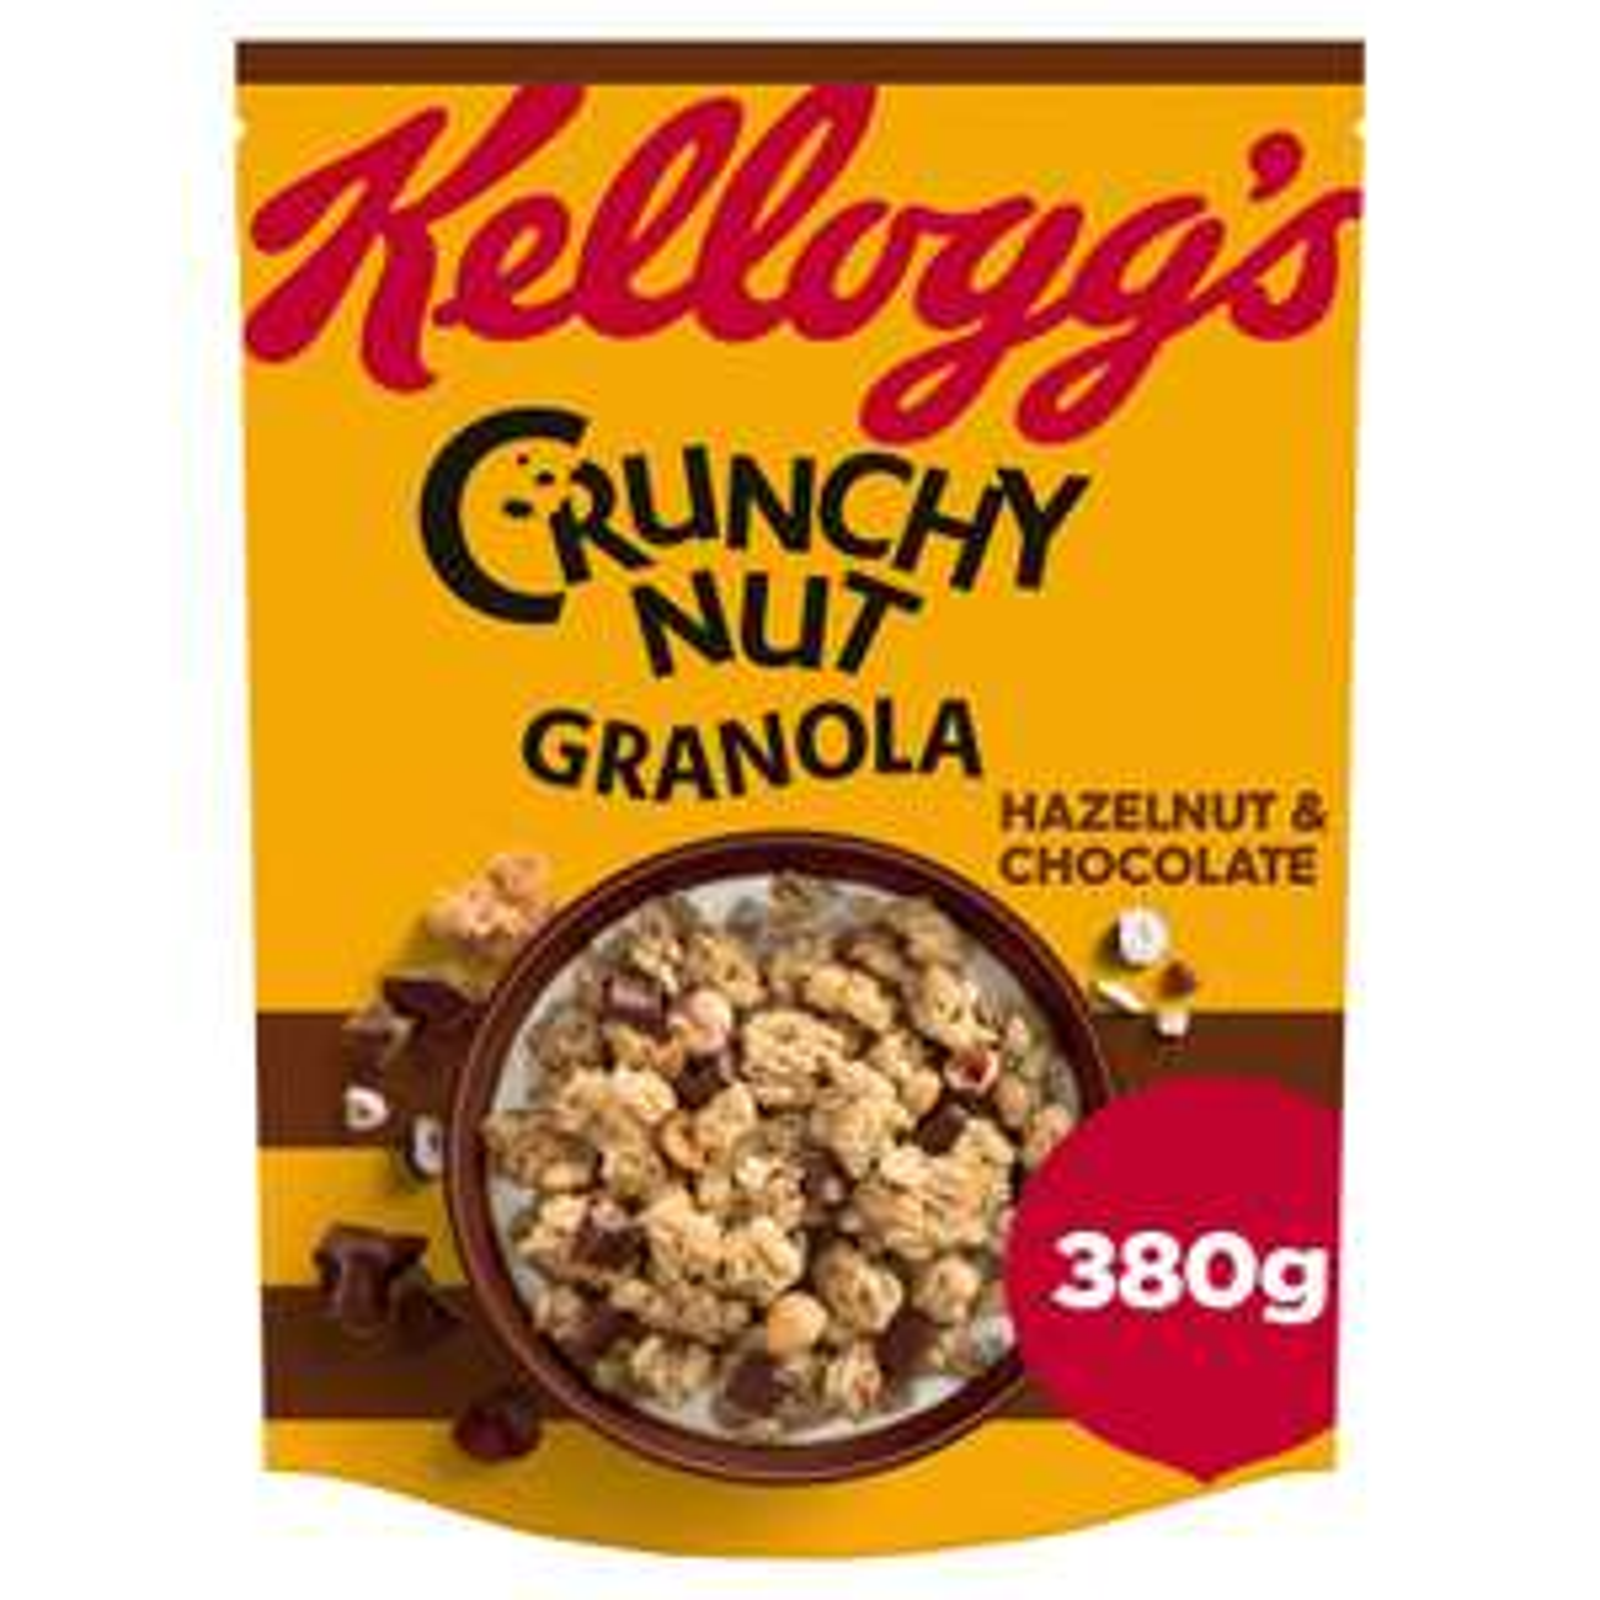 Chocolate Hazelnut Nuts discount offer